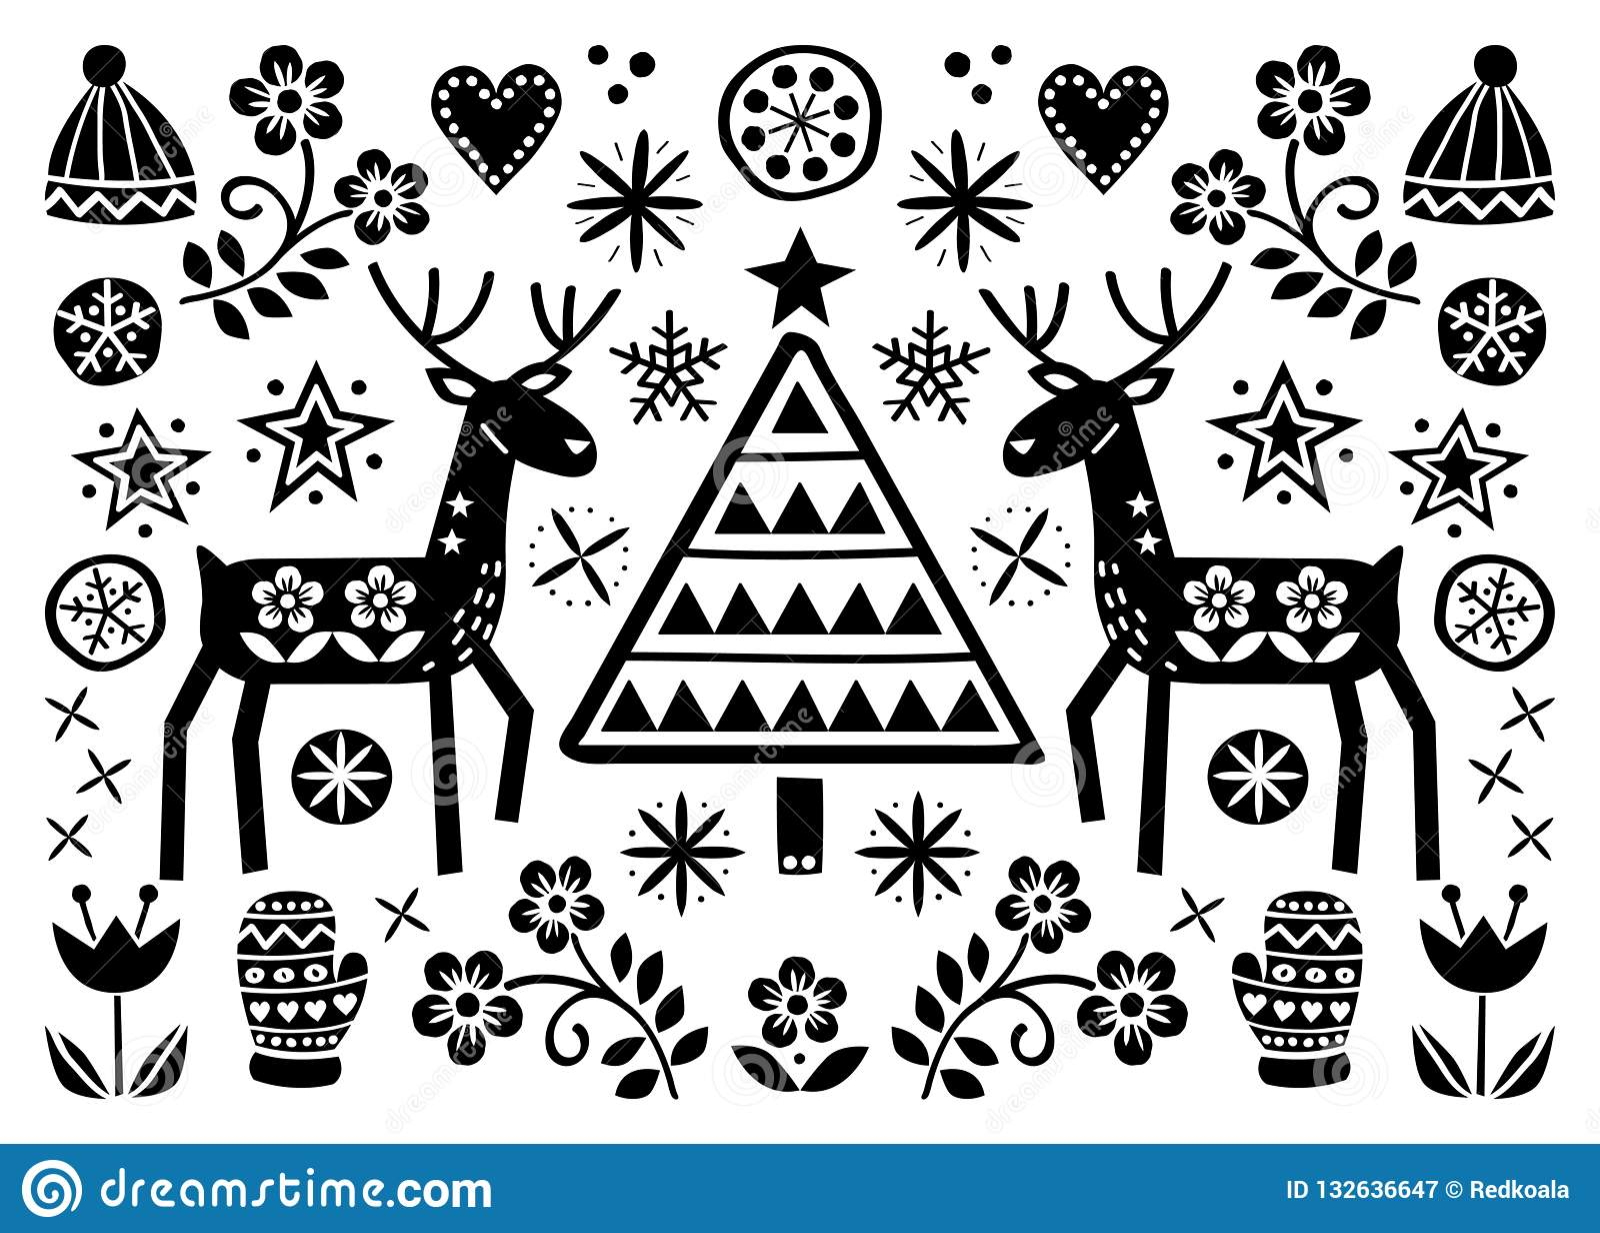 It Christmas Merr Christmas.Christmas Folk Art Greeting Card With Reindeer Flowers